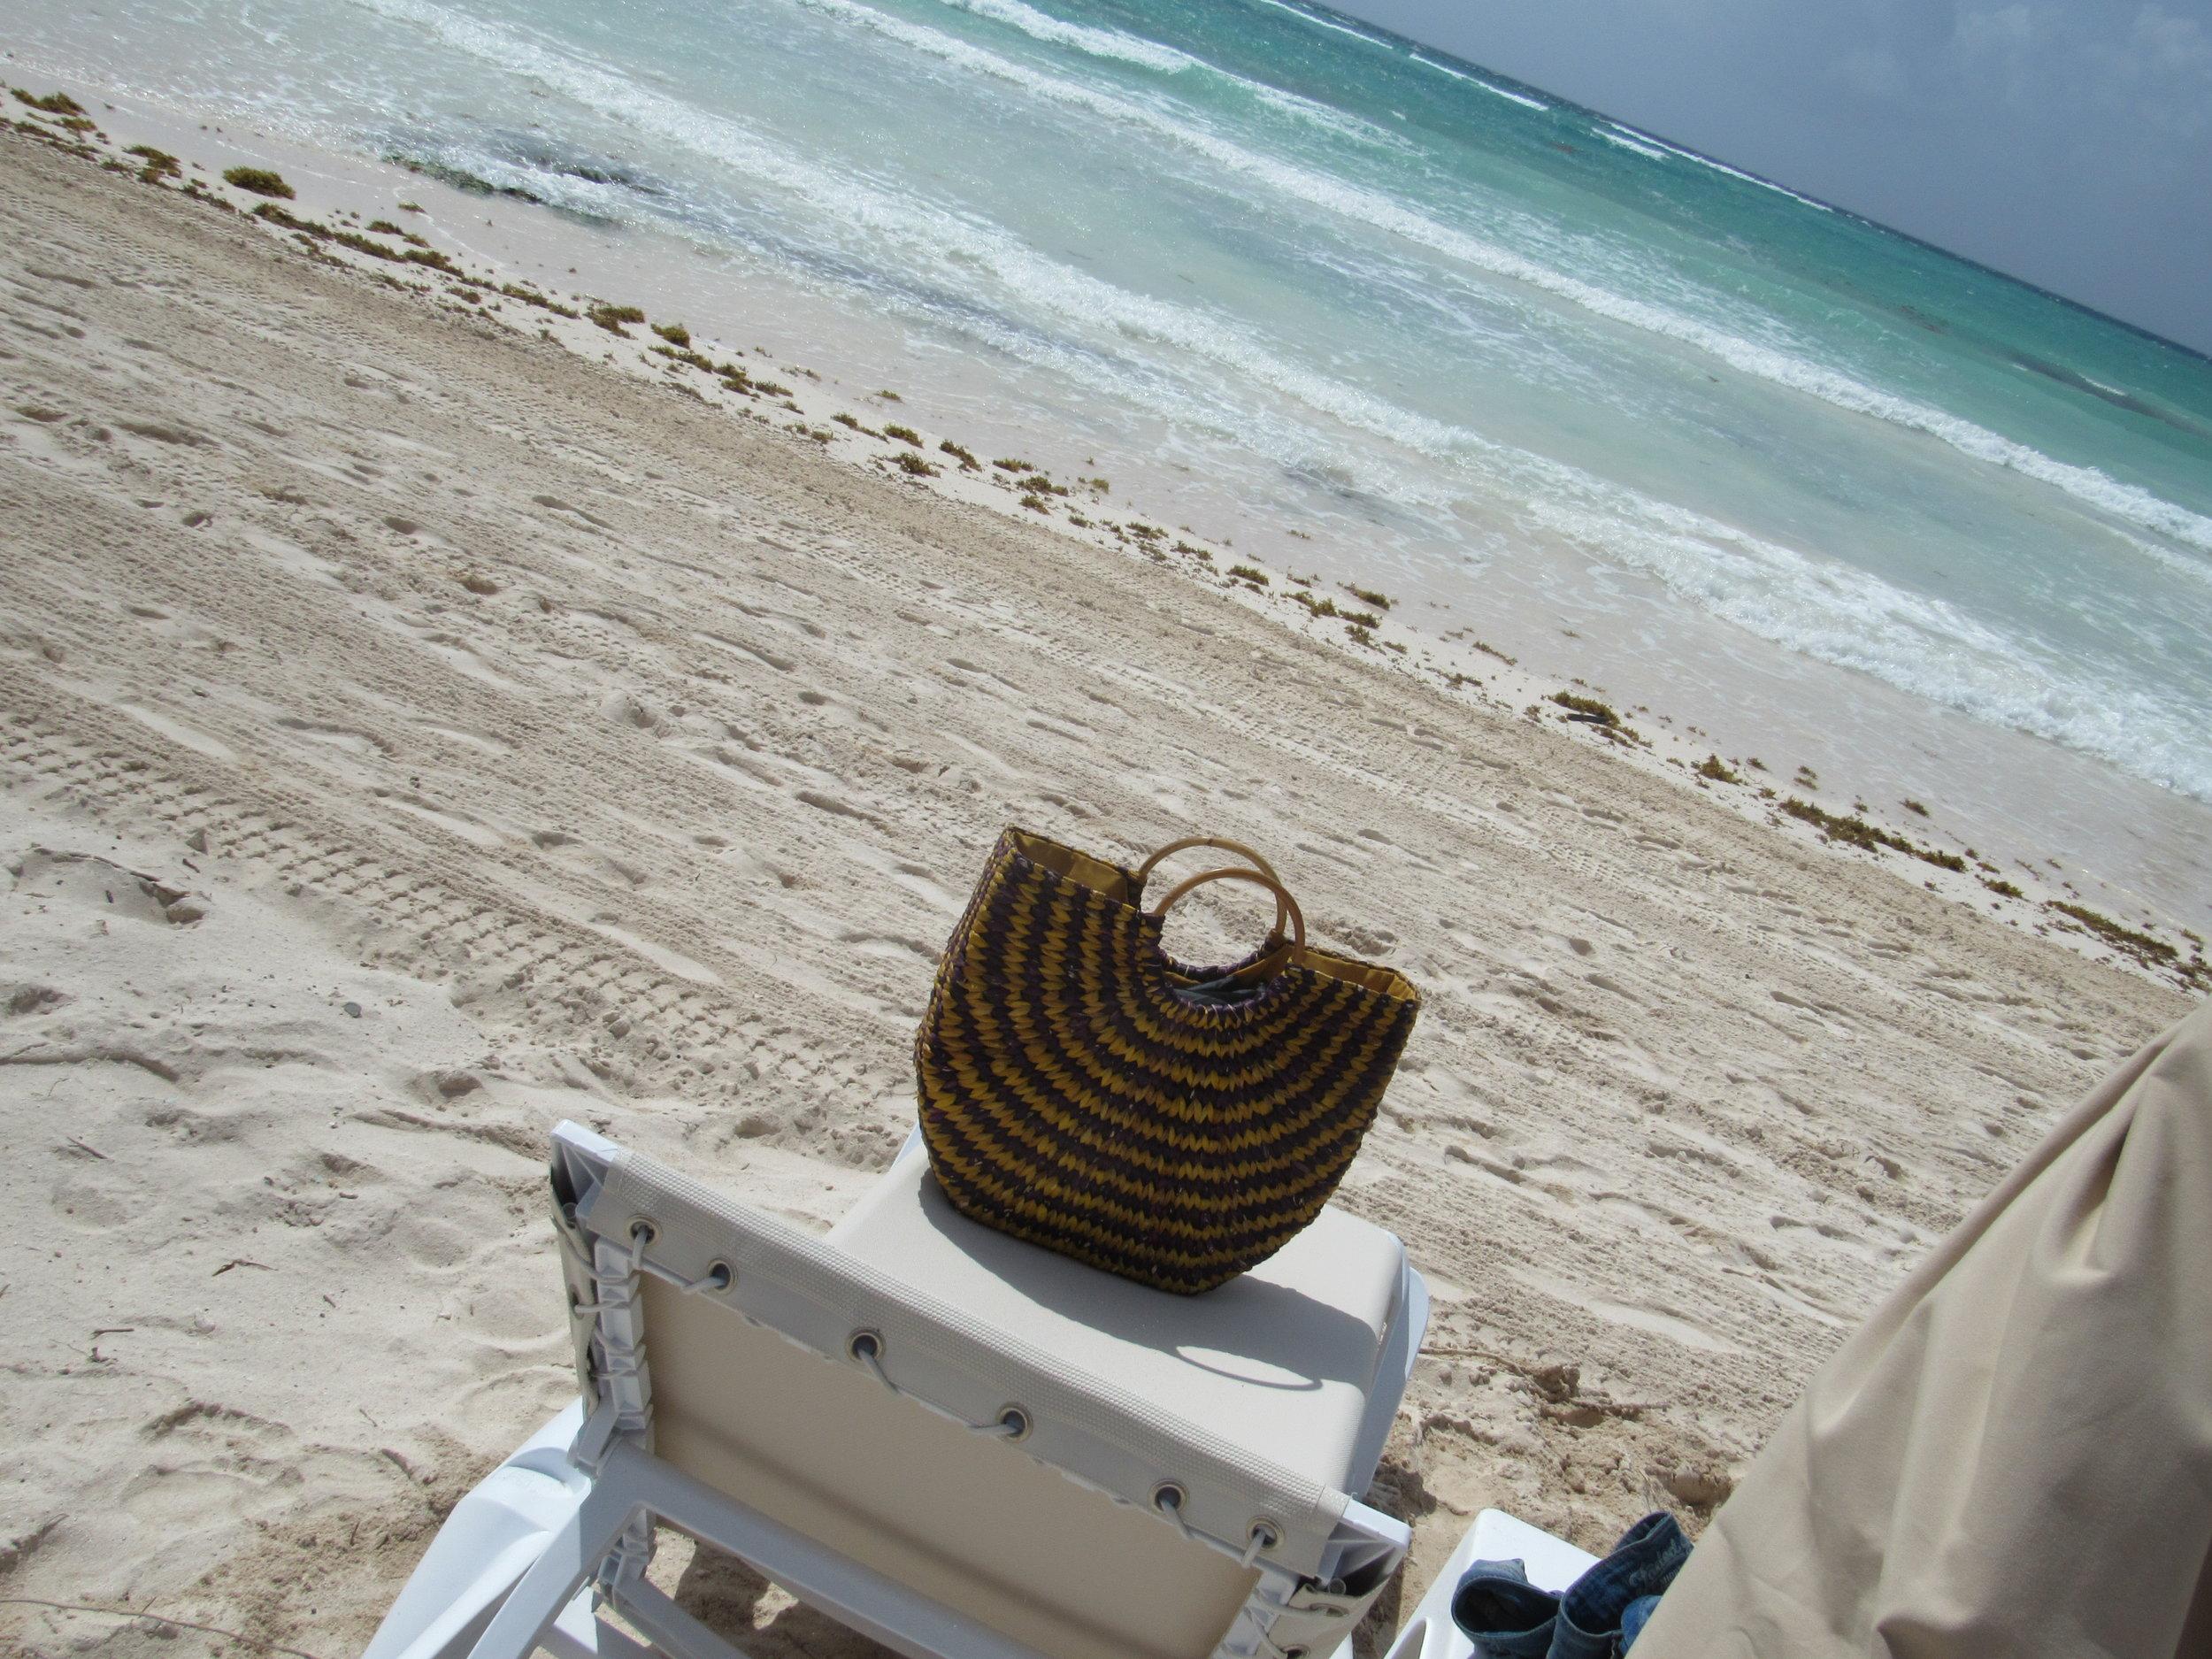 Beach Bag on Chair.JPG